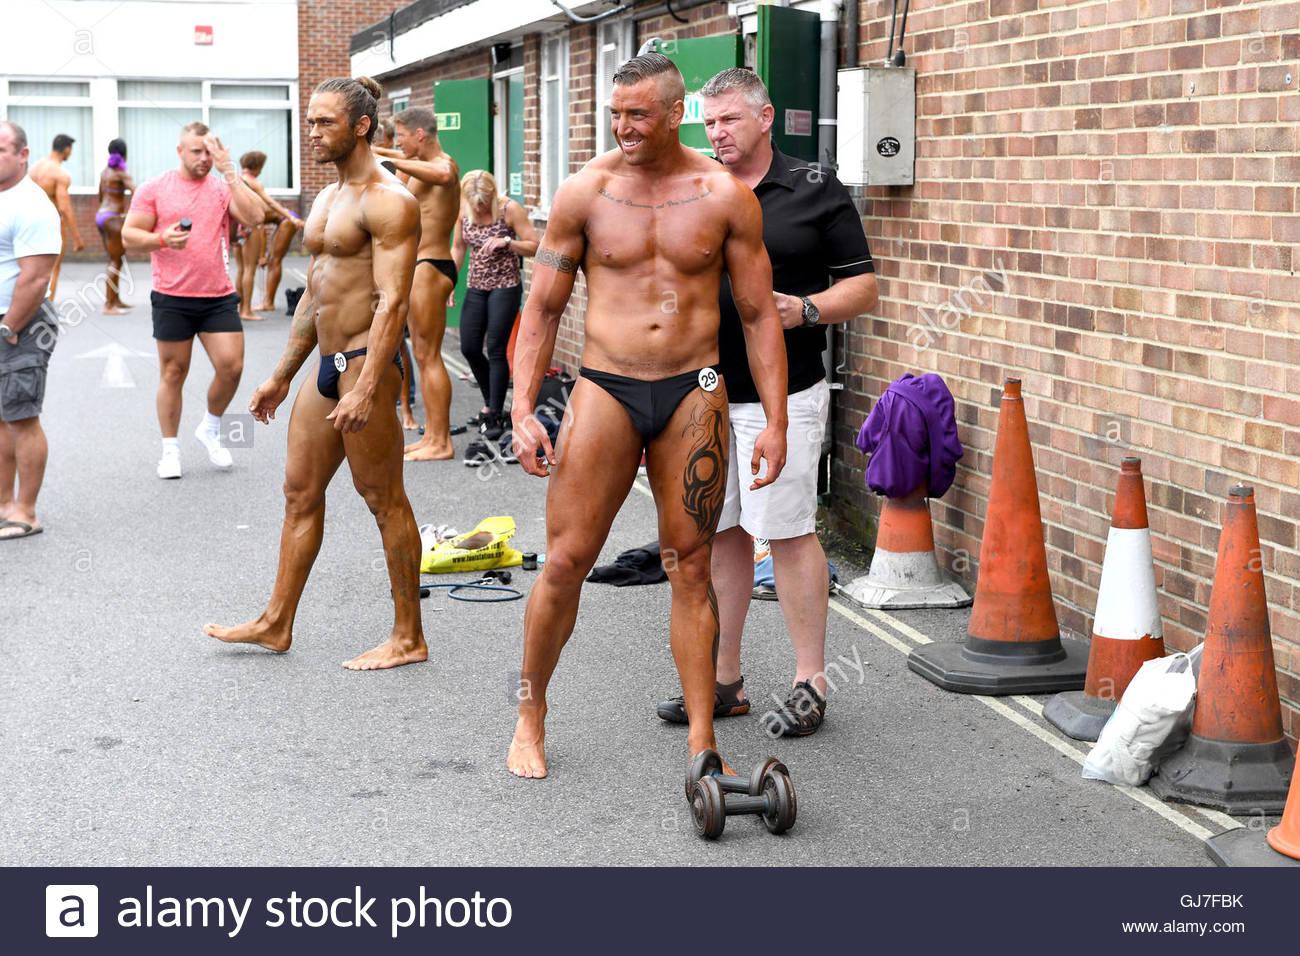 oregon-amateur-bodybuilding-competitions-models-topless